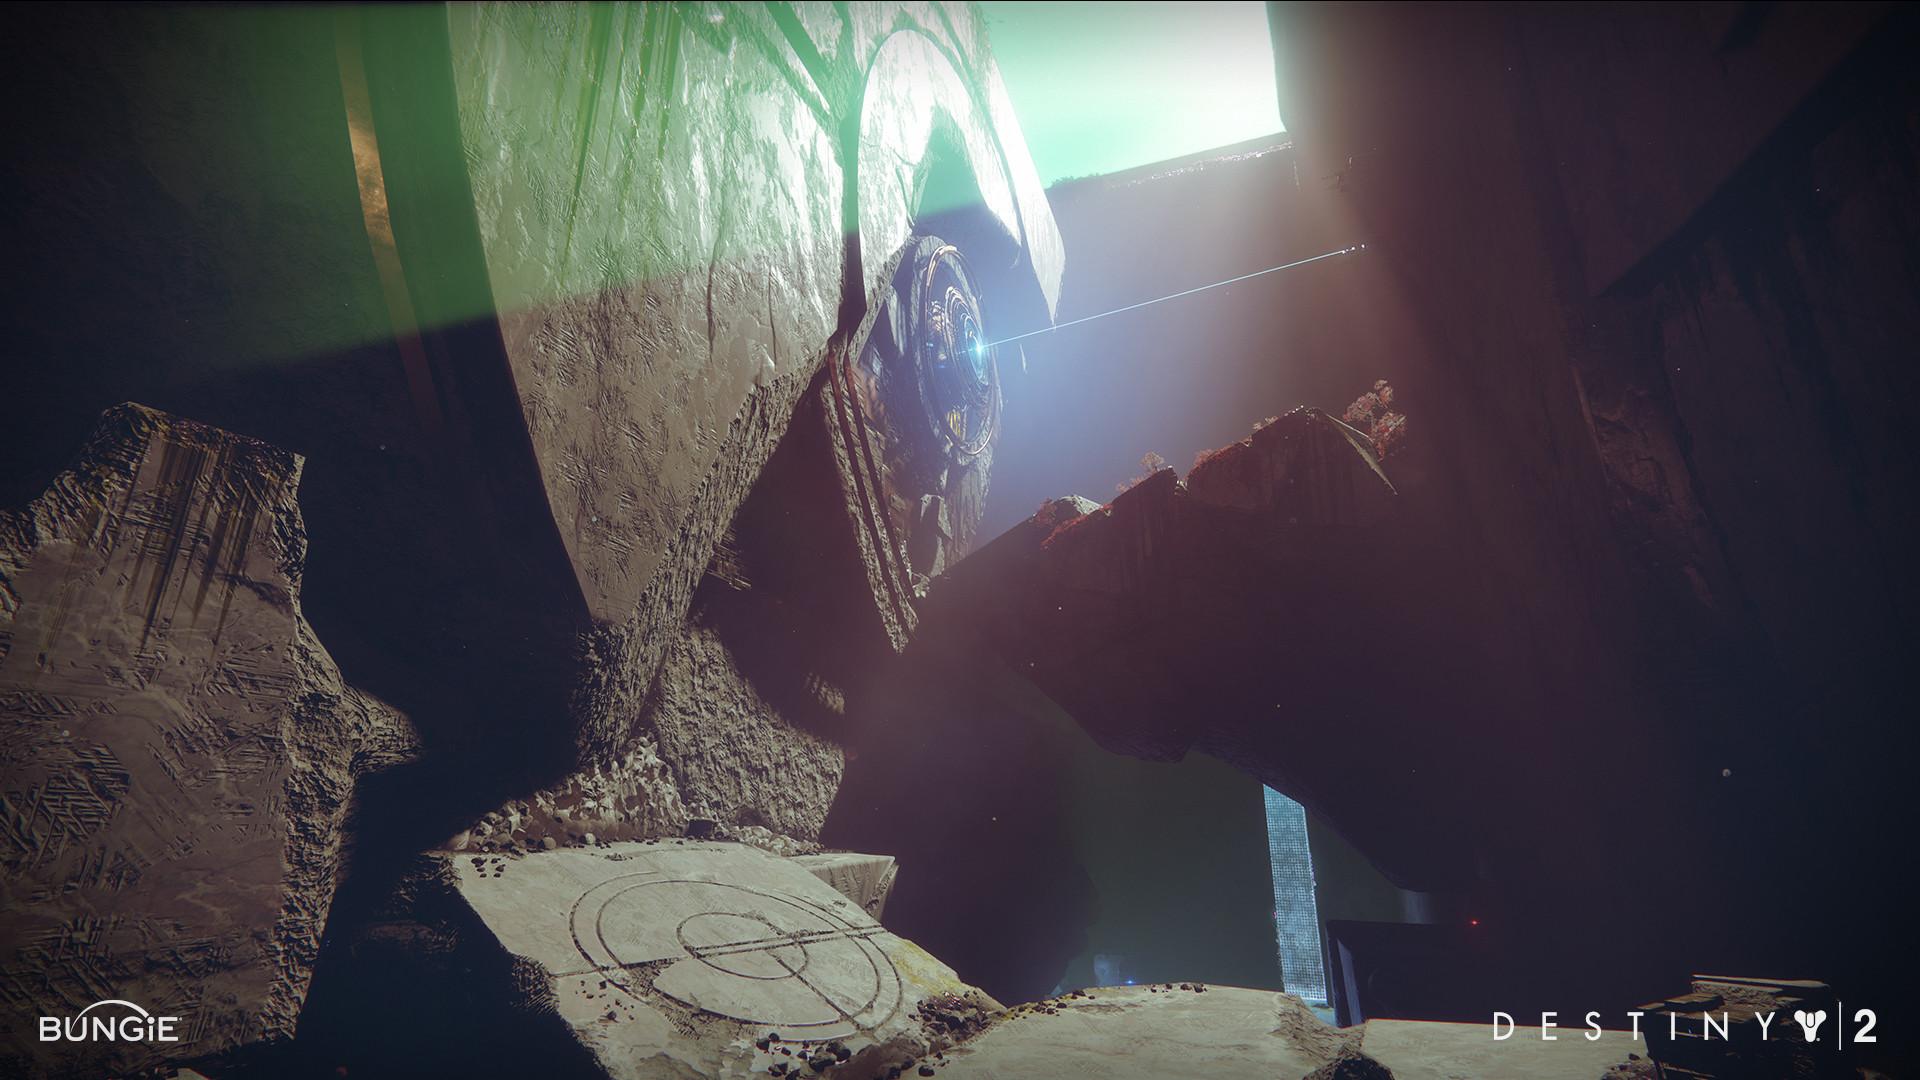 ArtStation - Destiny 2 (Bungie - 2017) Environment Lighting